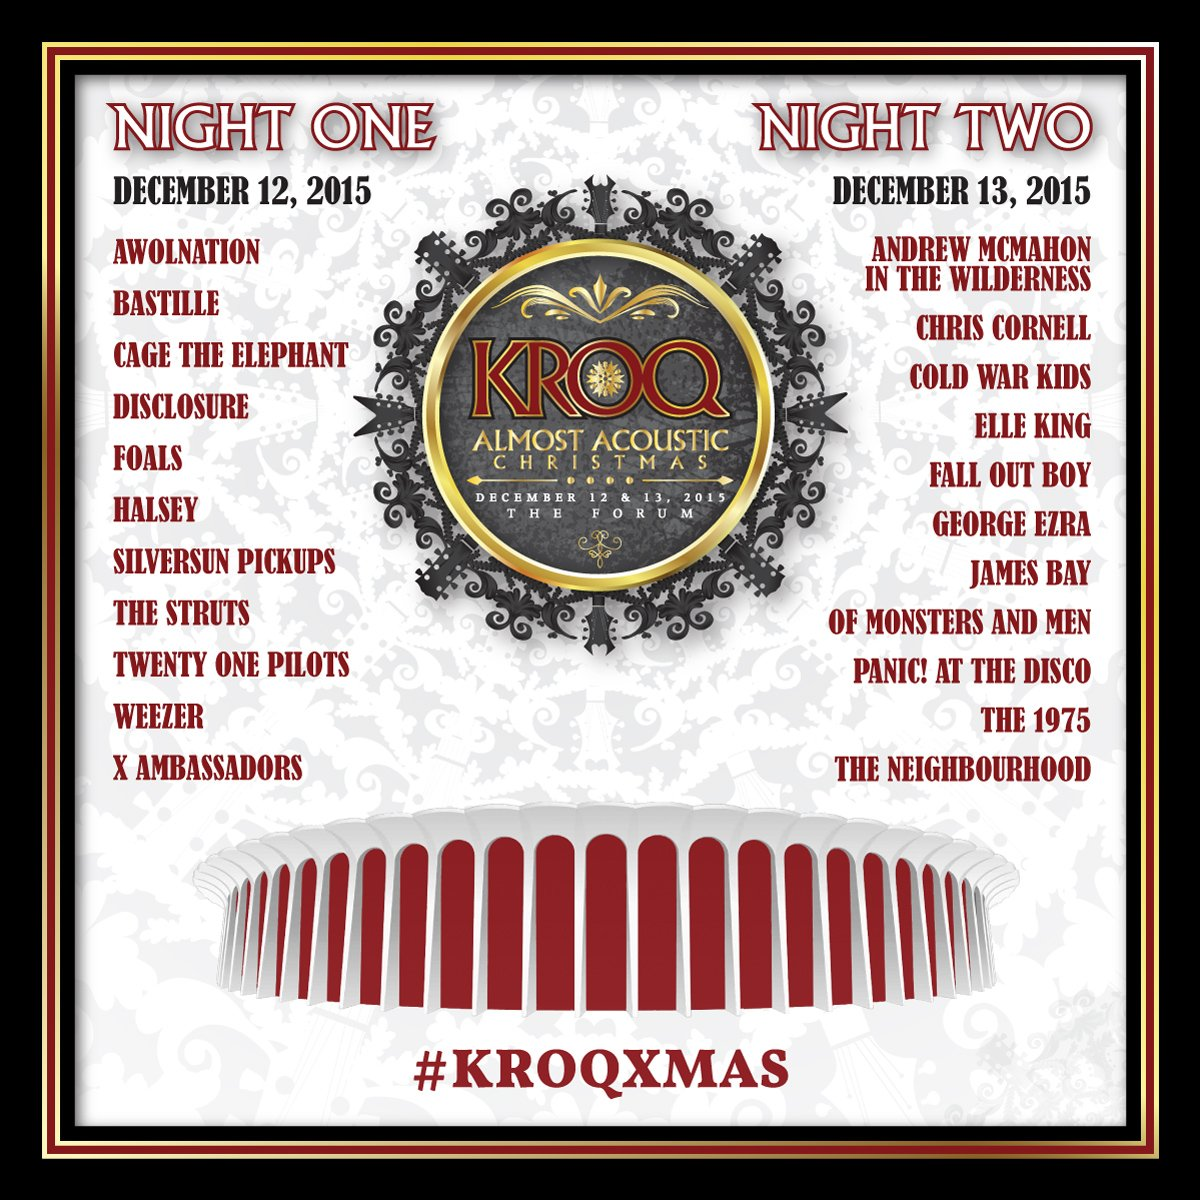 KROQ Almost Acoustic Christmas 2015 Lineup & Details https://t.co/ukgApZGwTo #KROQXMAS https://t.co/Lf6lS9euBl